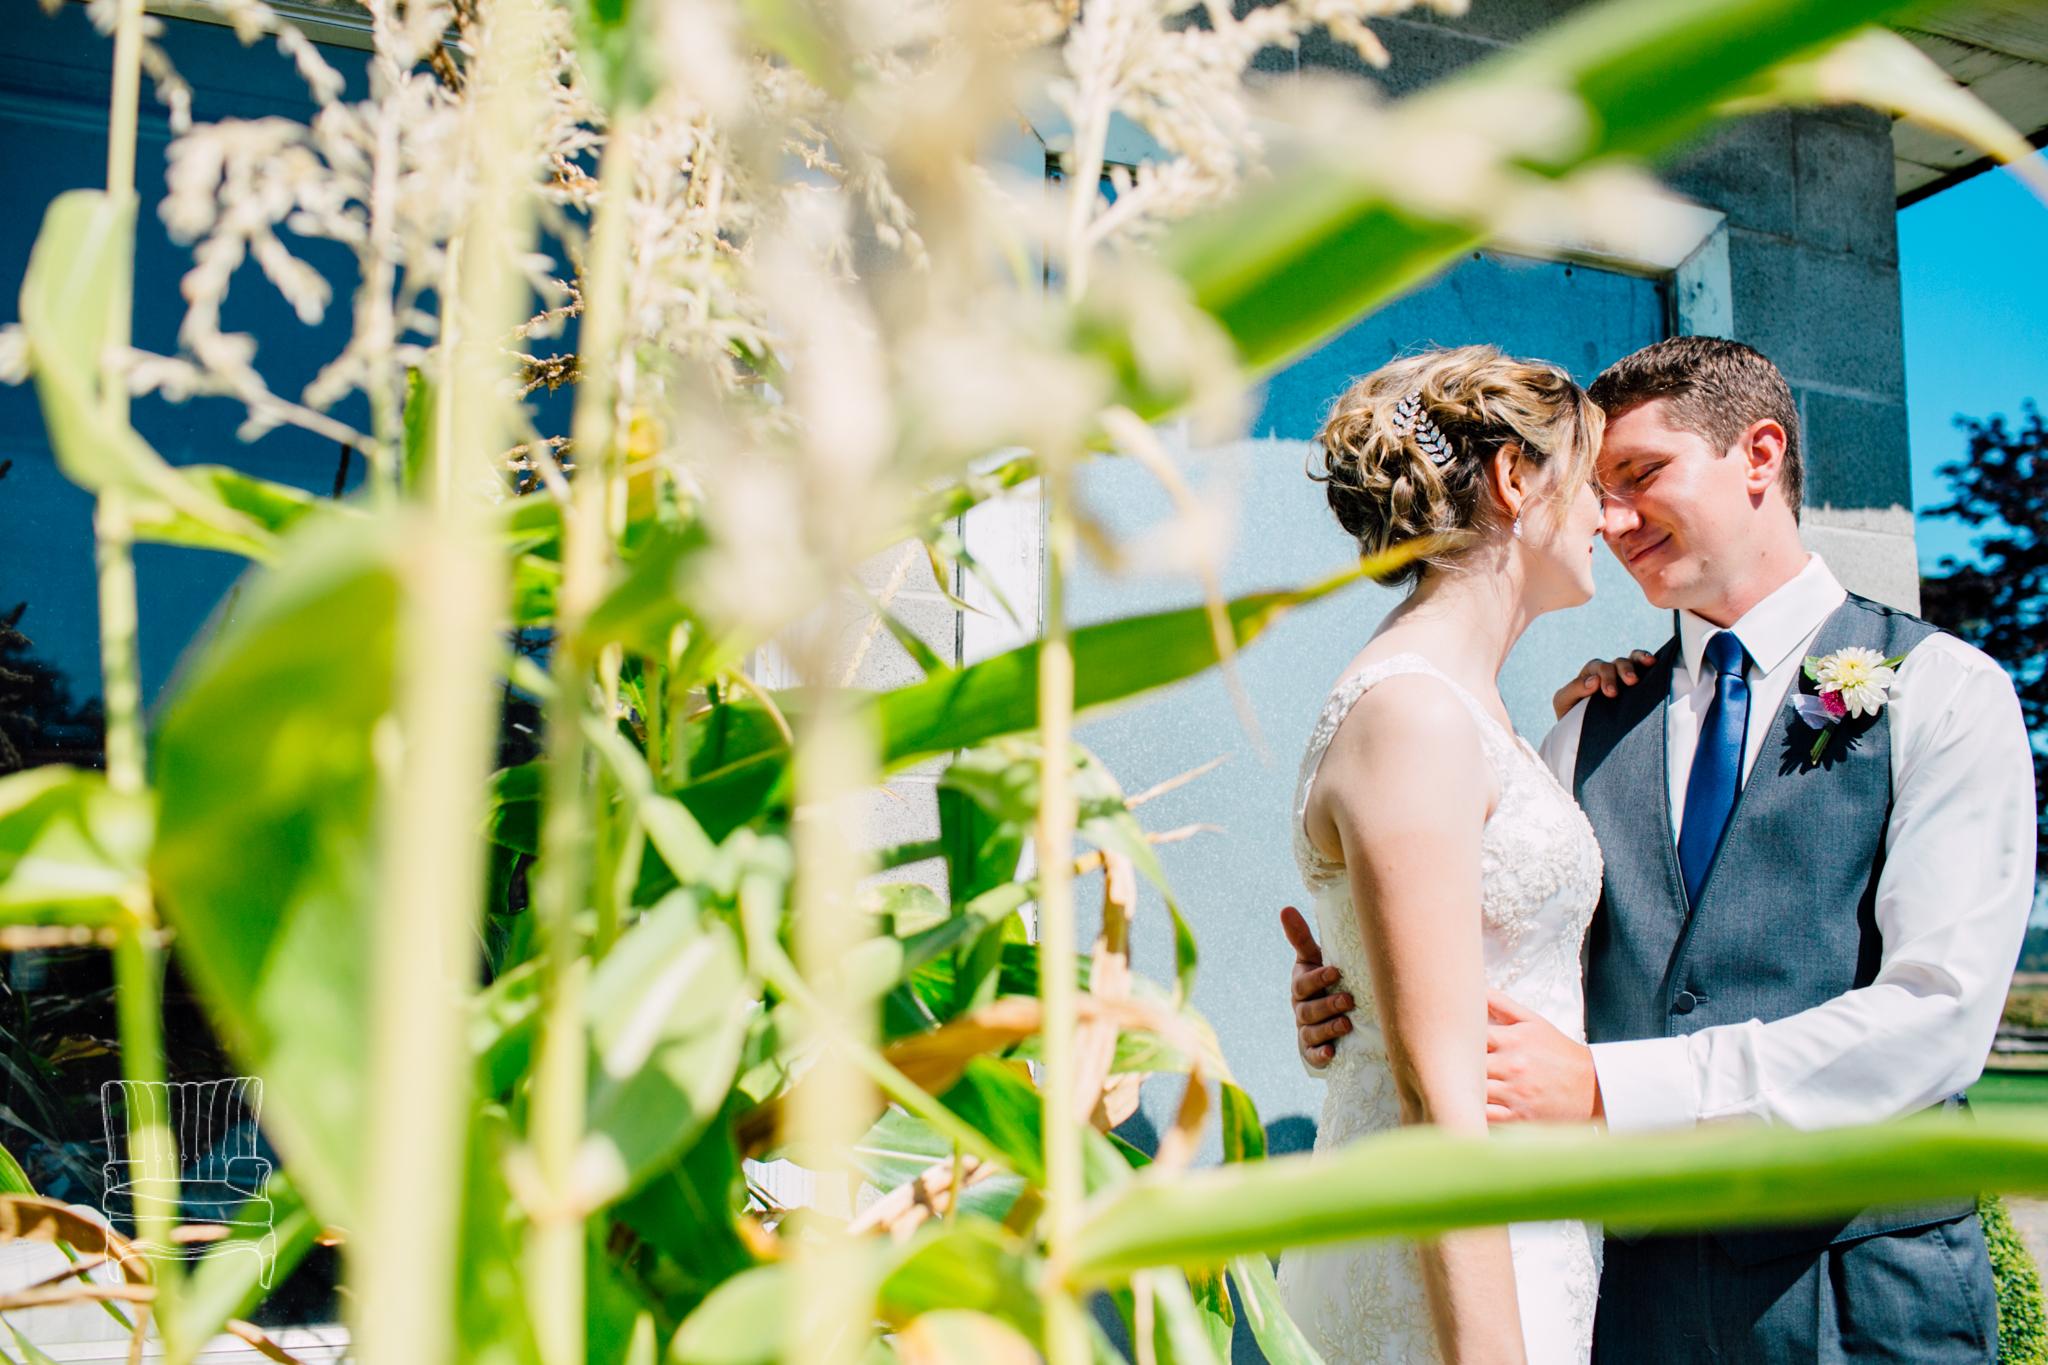 samson-estate-winery-wedding-katheryn-moran-photography-jillmike-4.jpg